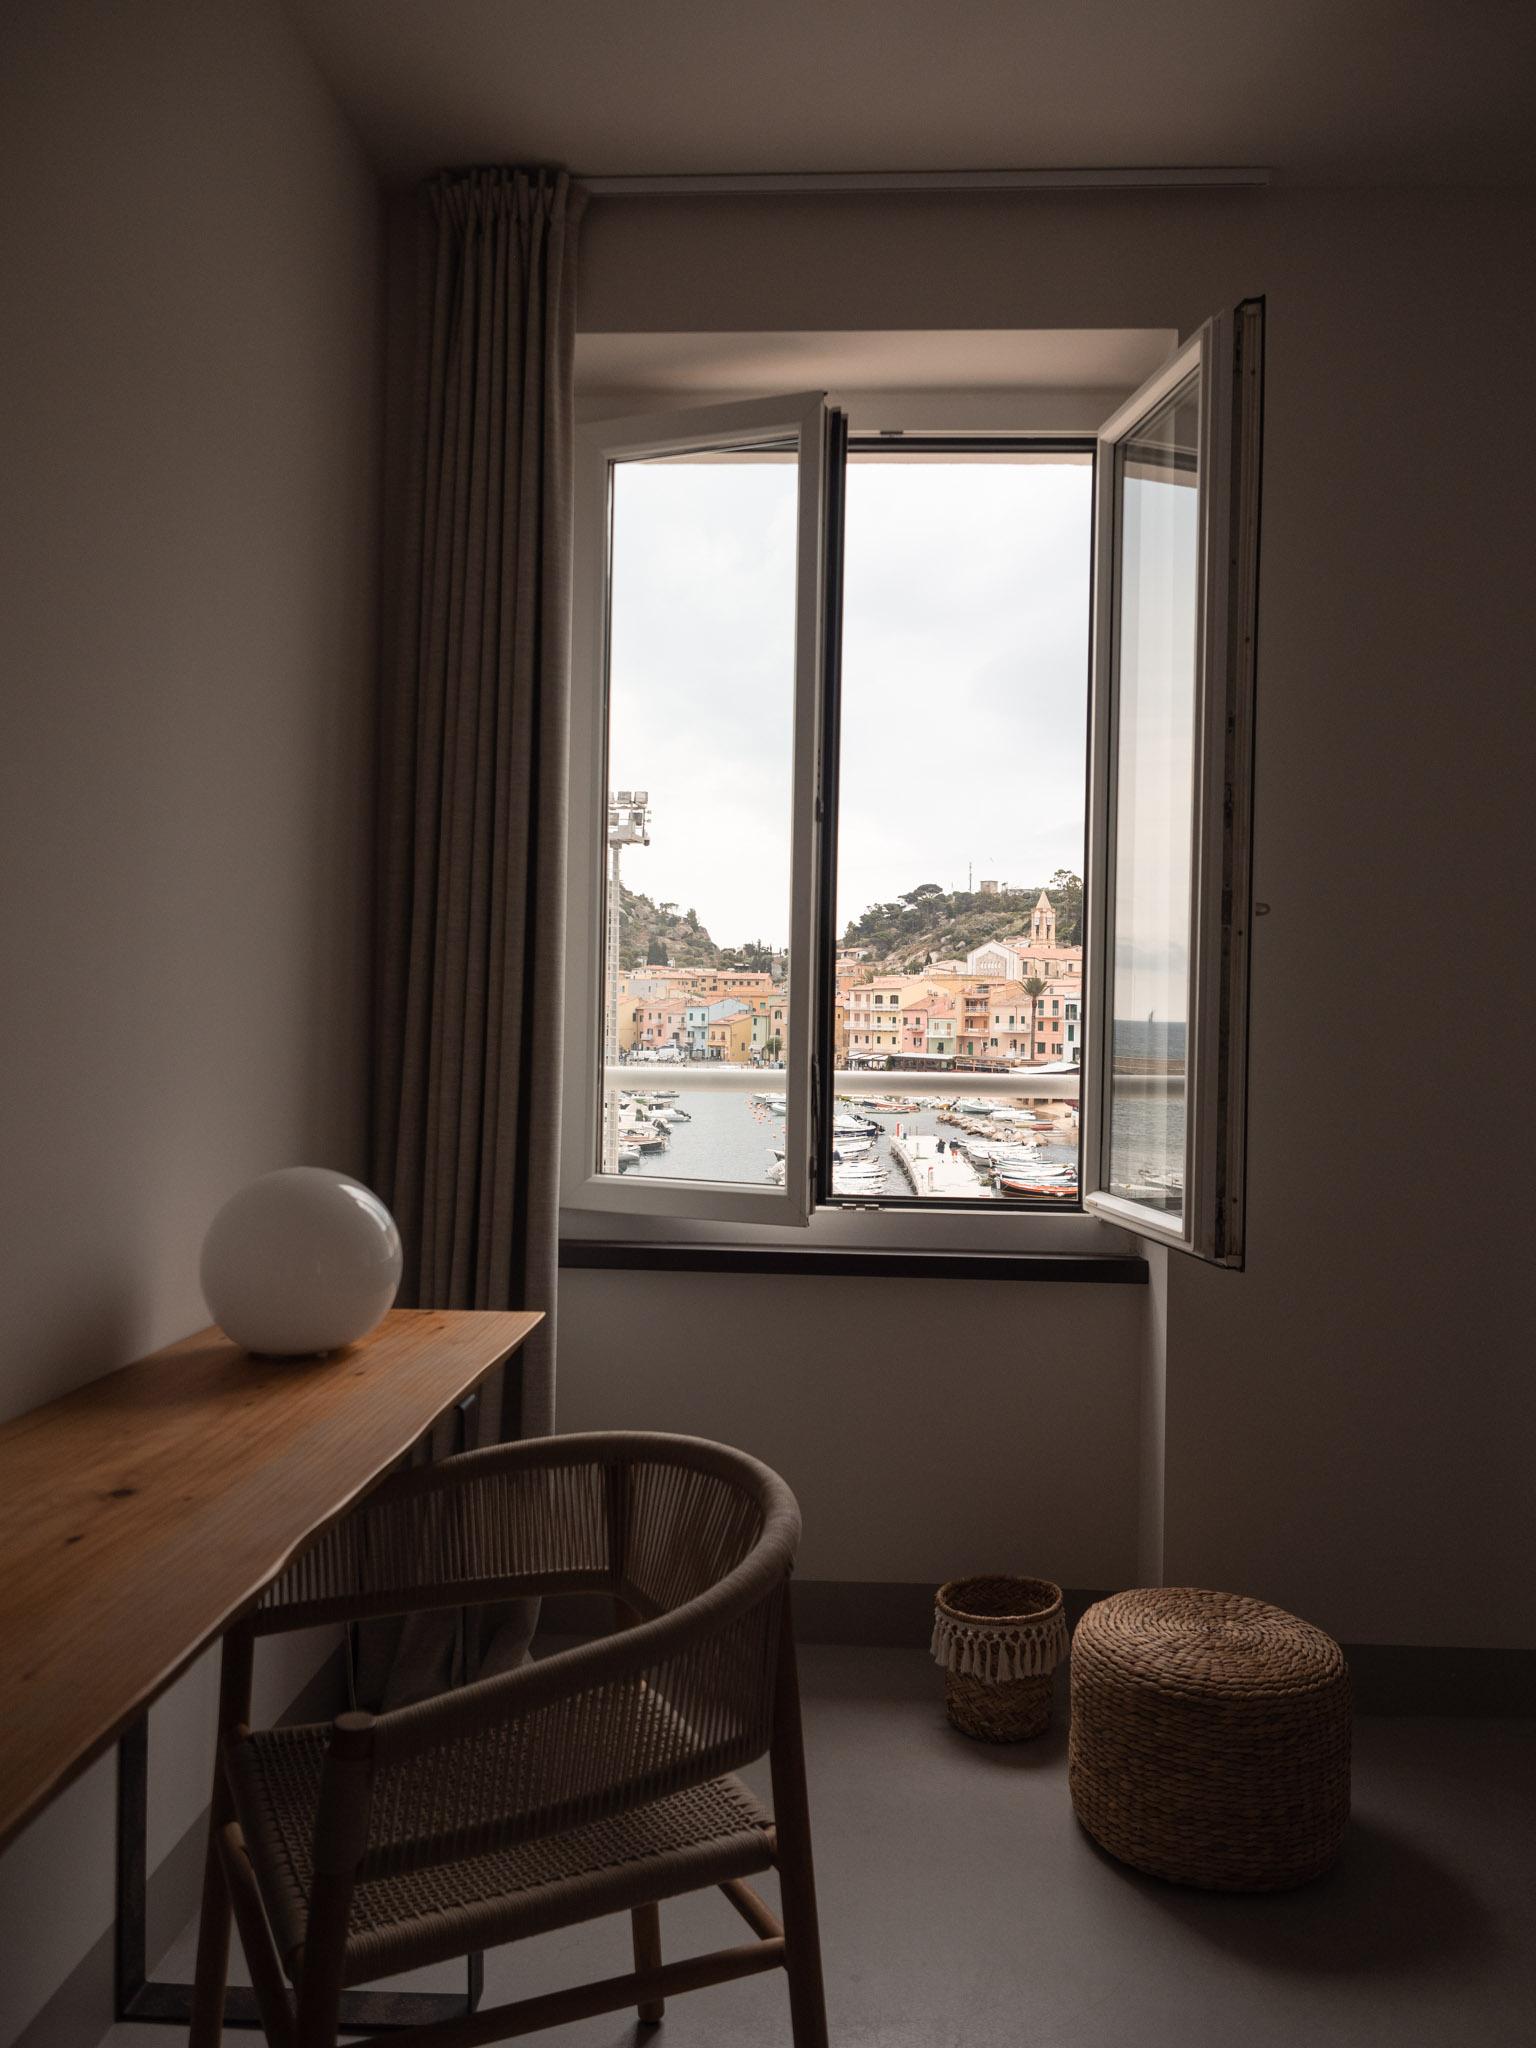 La Guardia Hotel Giglio Island Tuscany Italy